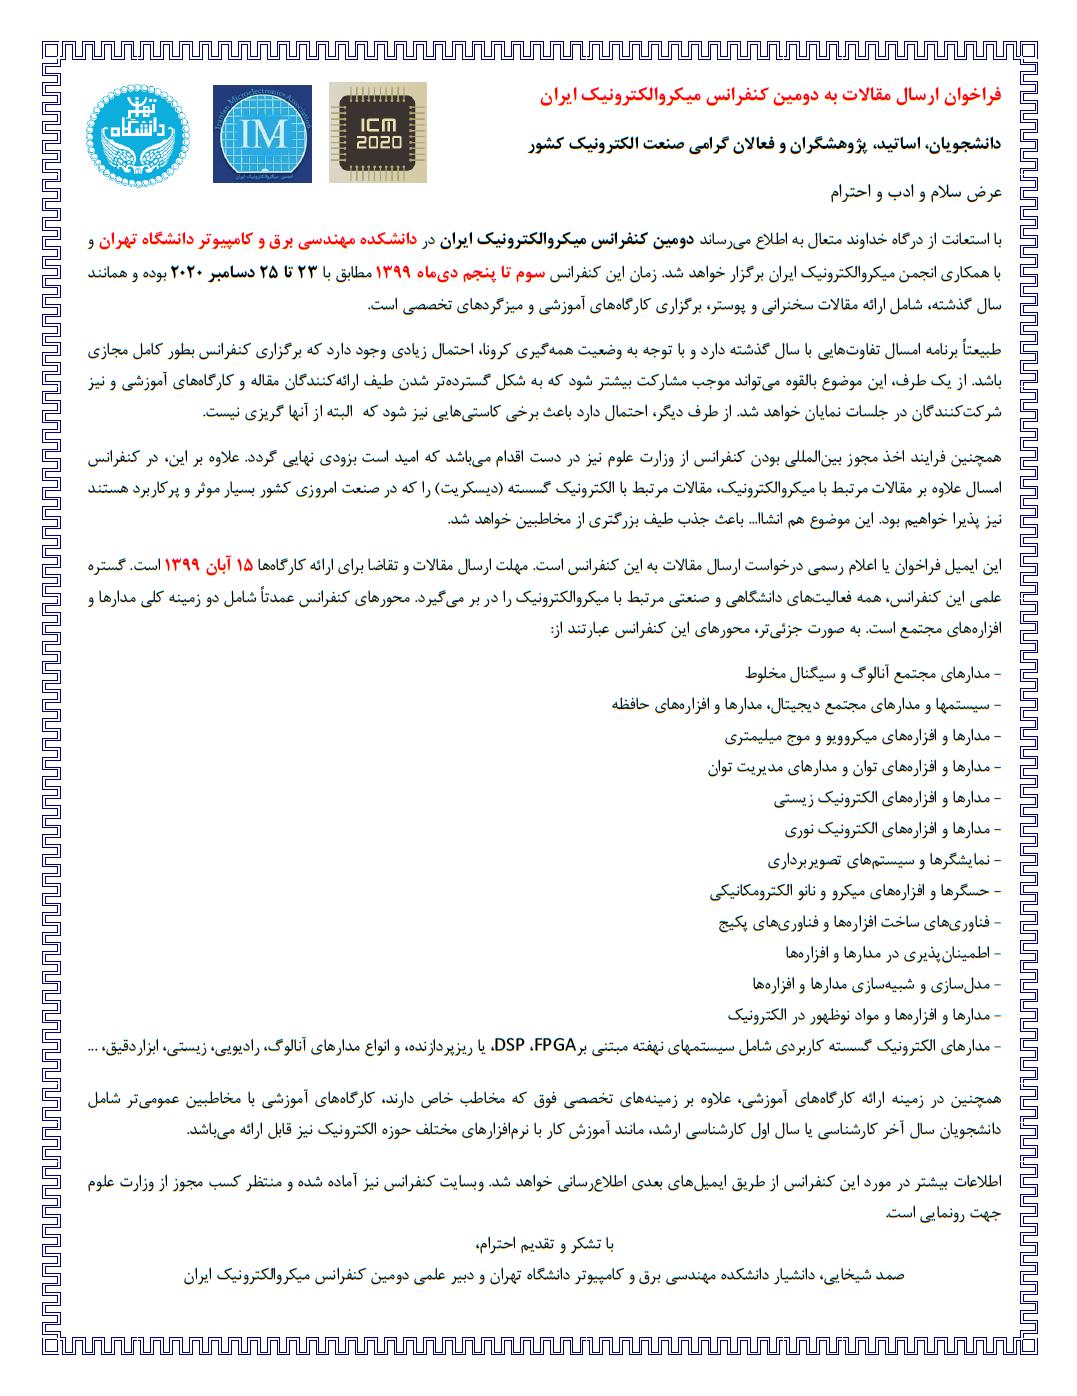 دومین کنفرانس بینالمللی میکروالکترونیک ایران